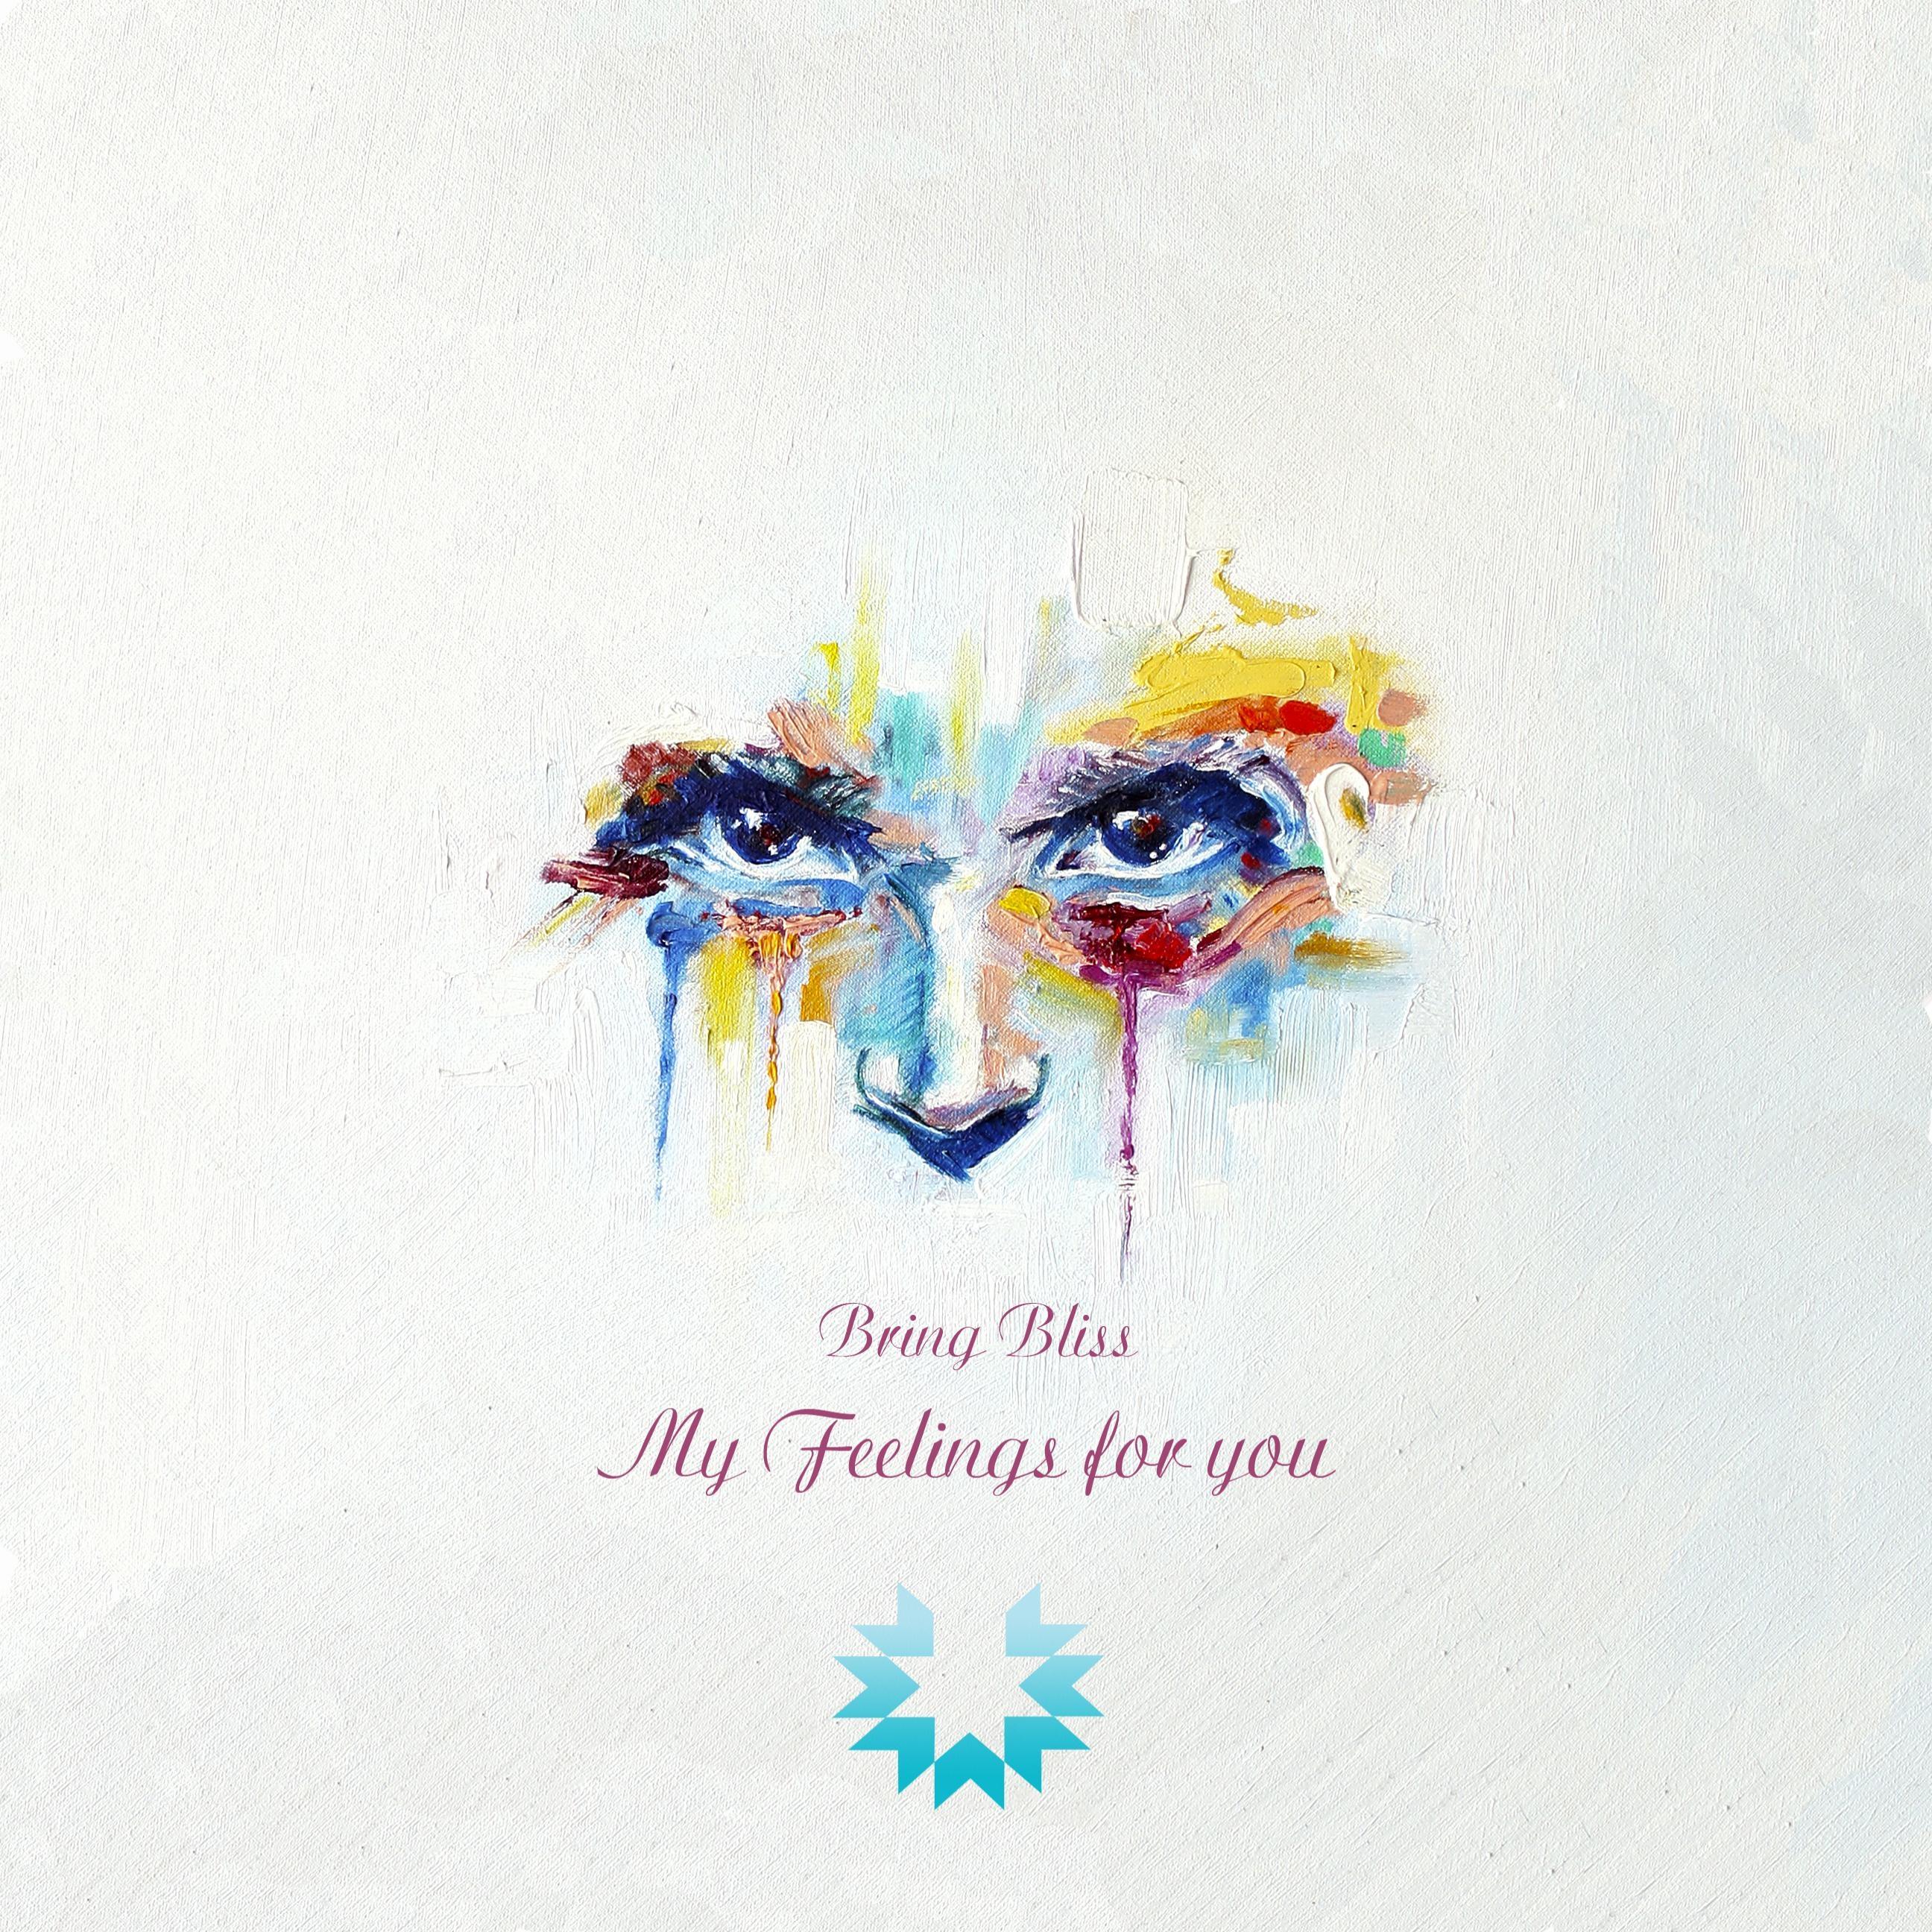 Bring Bliss - Lost (Original Mix)